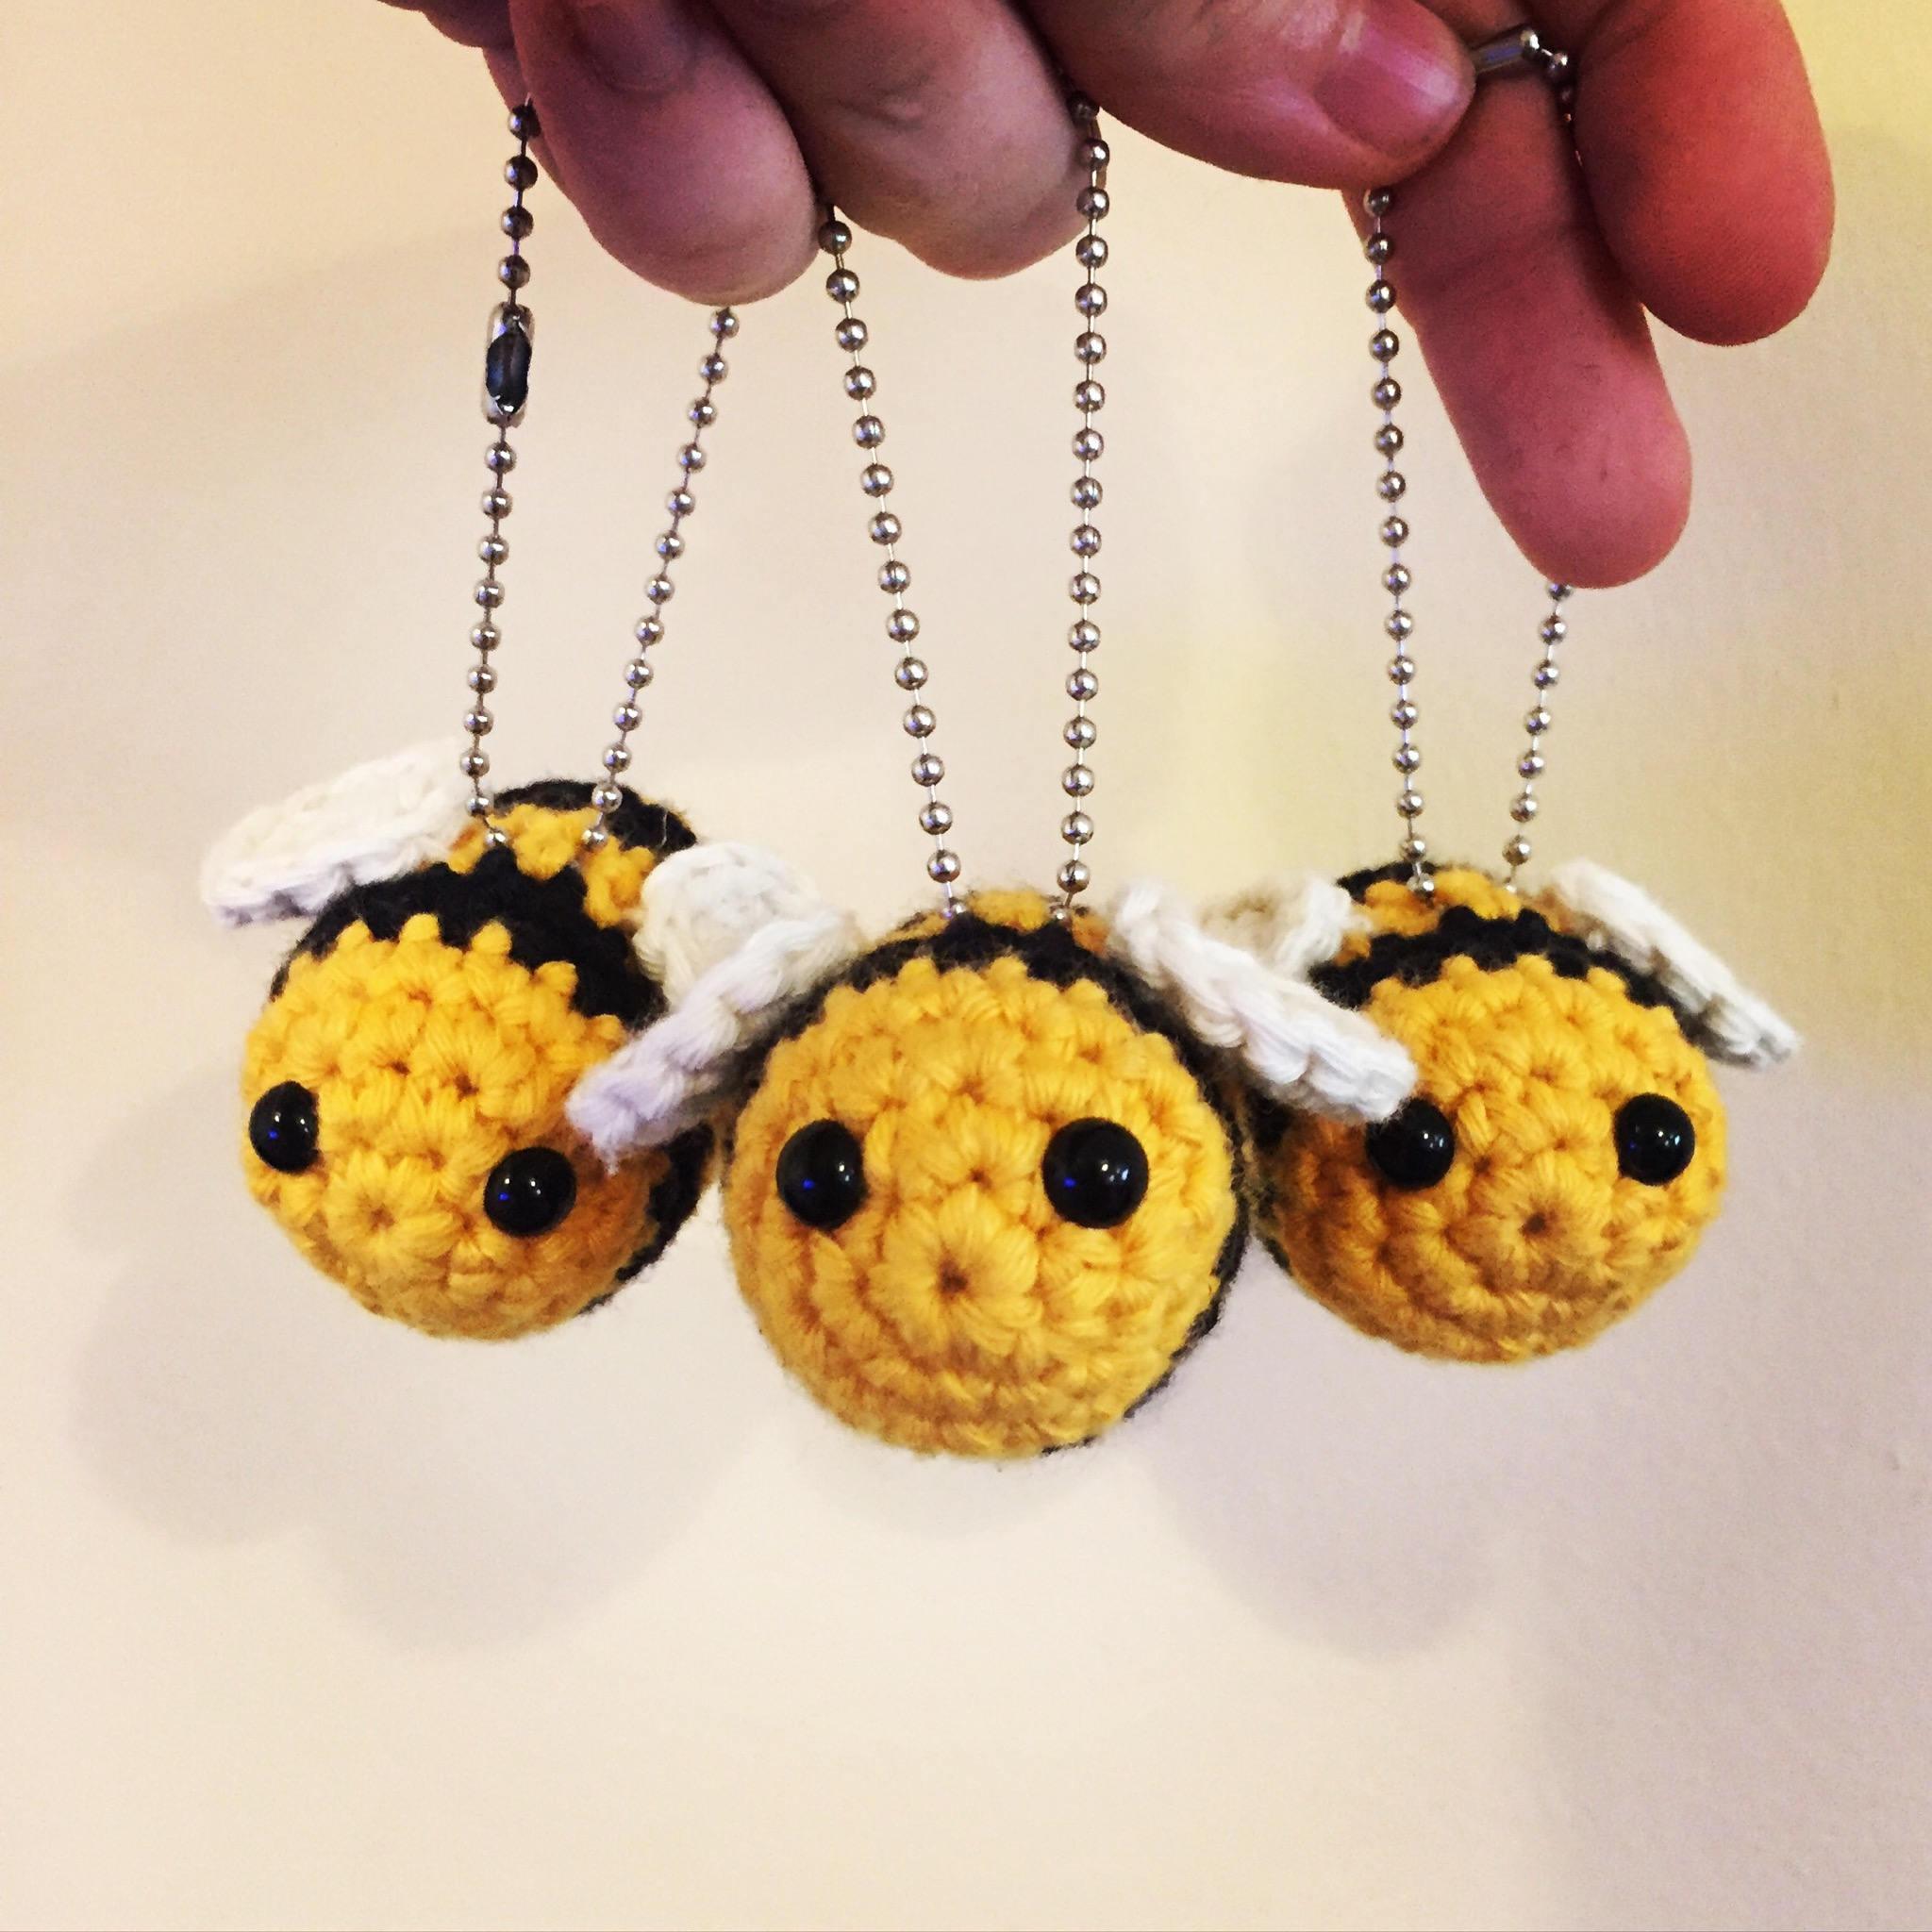 Bumble the bee crochet keychain/key ring pattern. Amigurumi